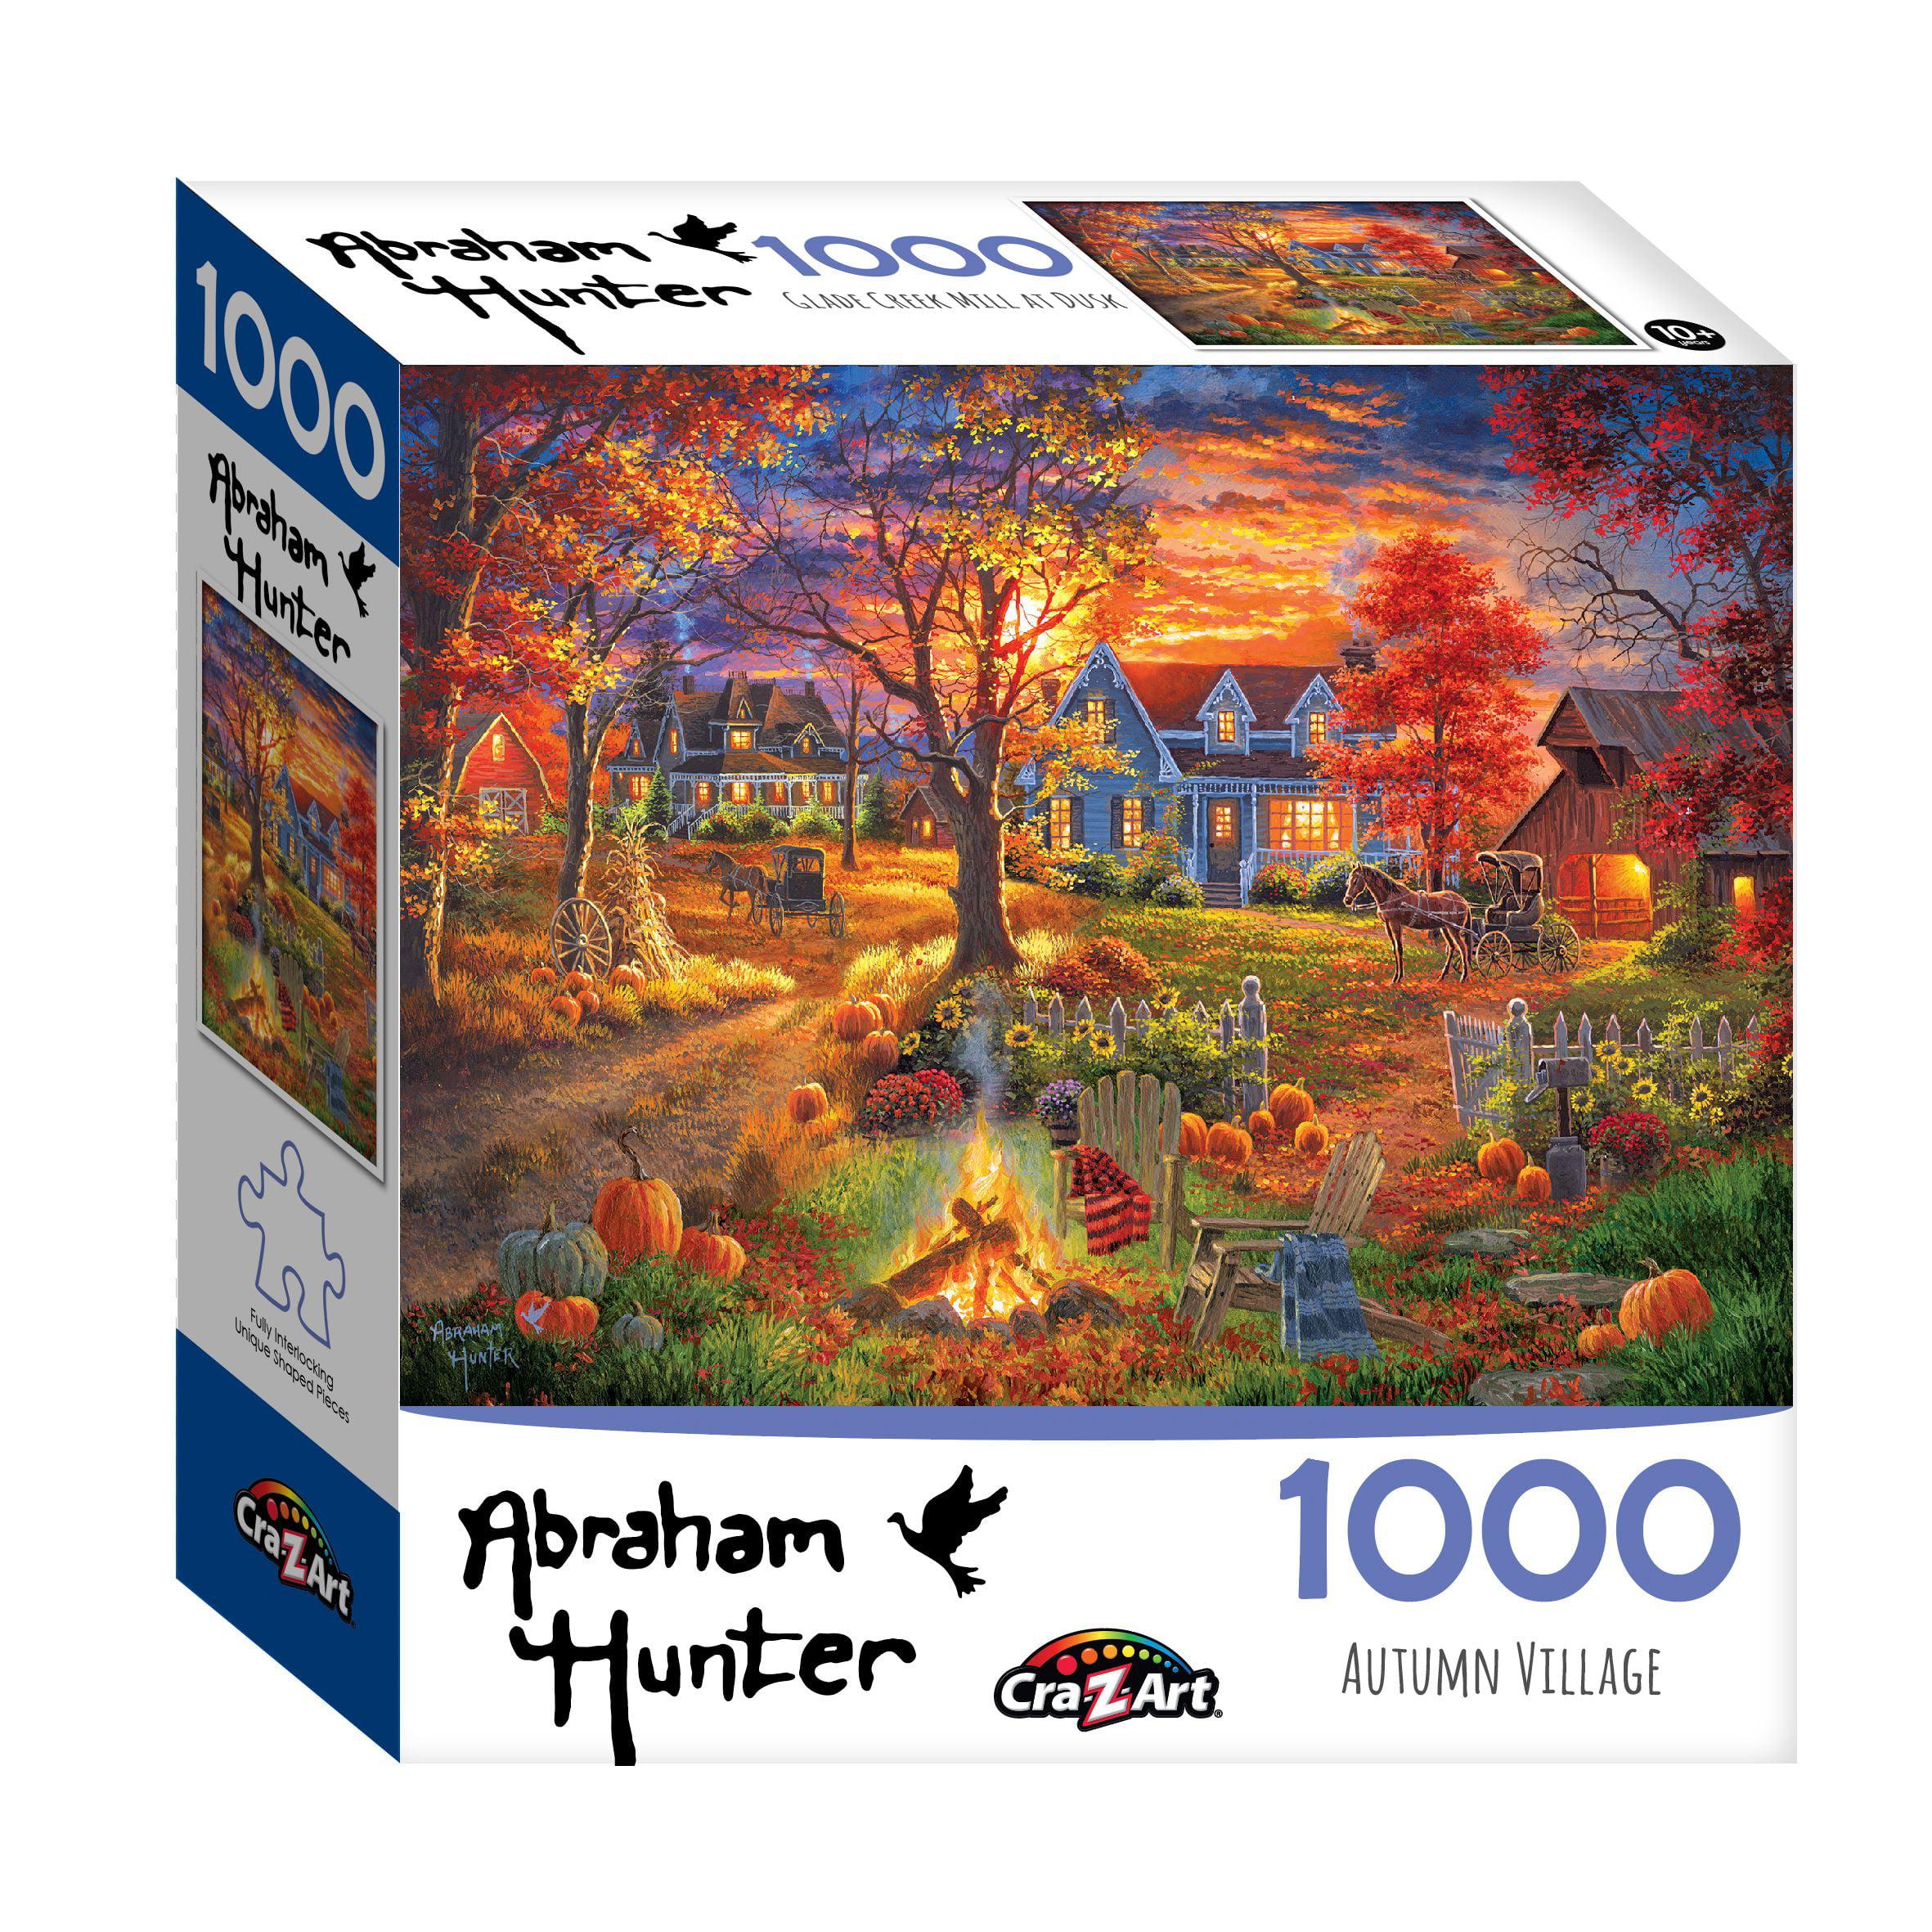 Vermont Christmas Company Paradise Cove Kids Jigsaw Puzzle 100 Piece